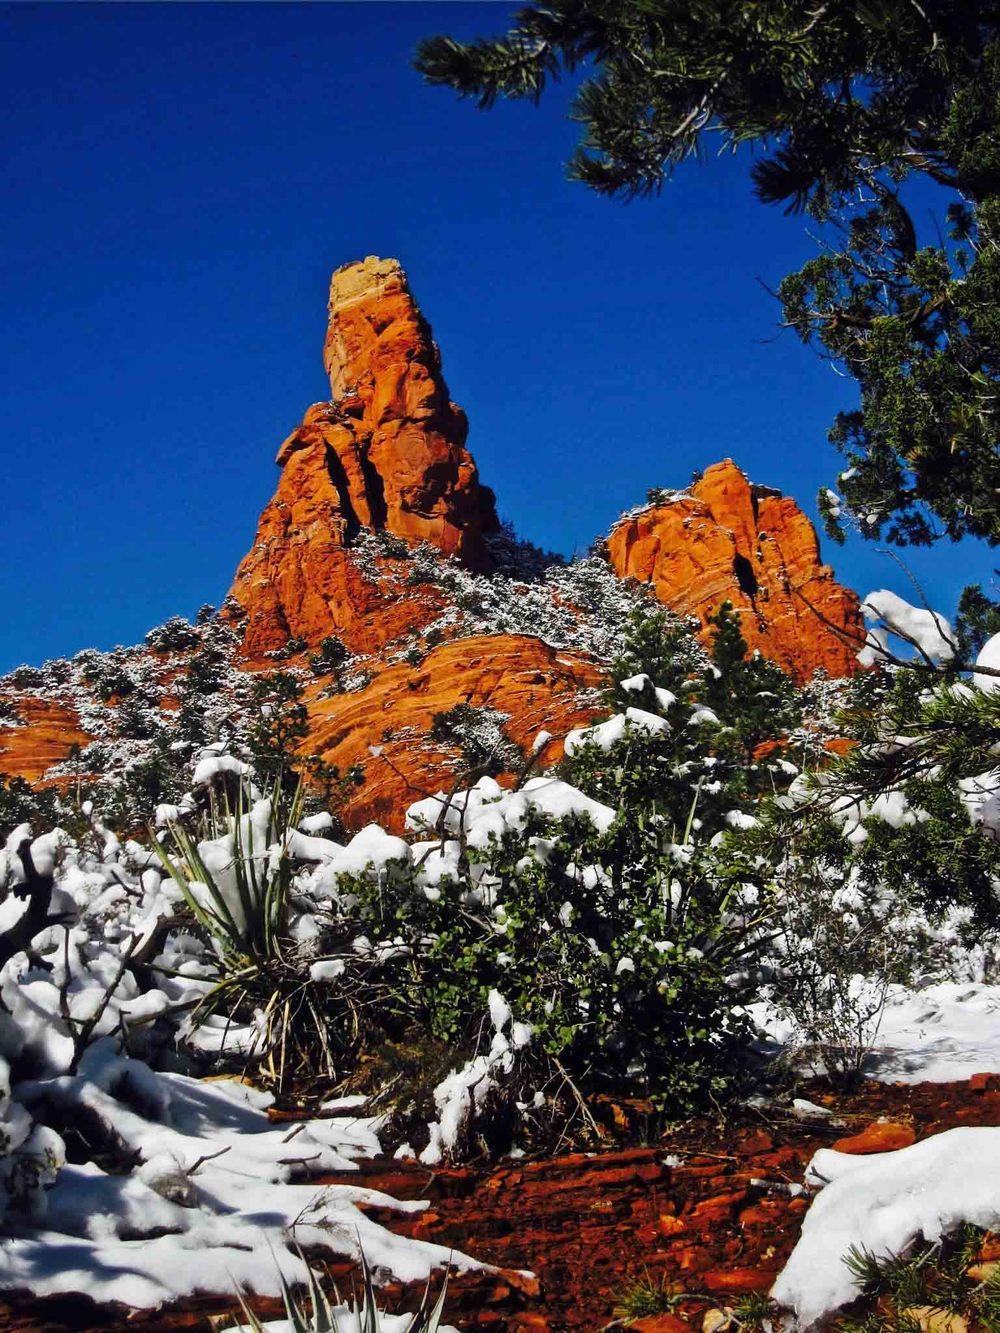 Soldiers' Pass, Sedona, Arizona, January 2011